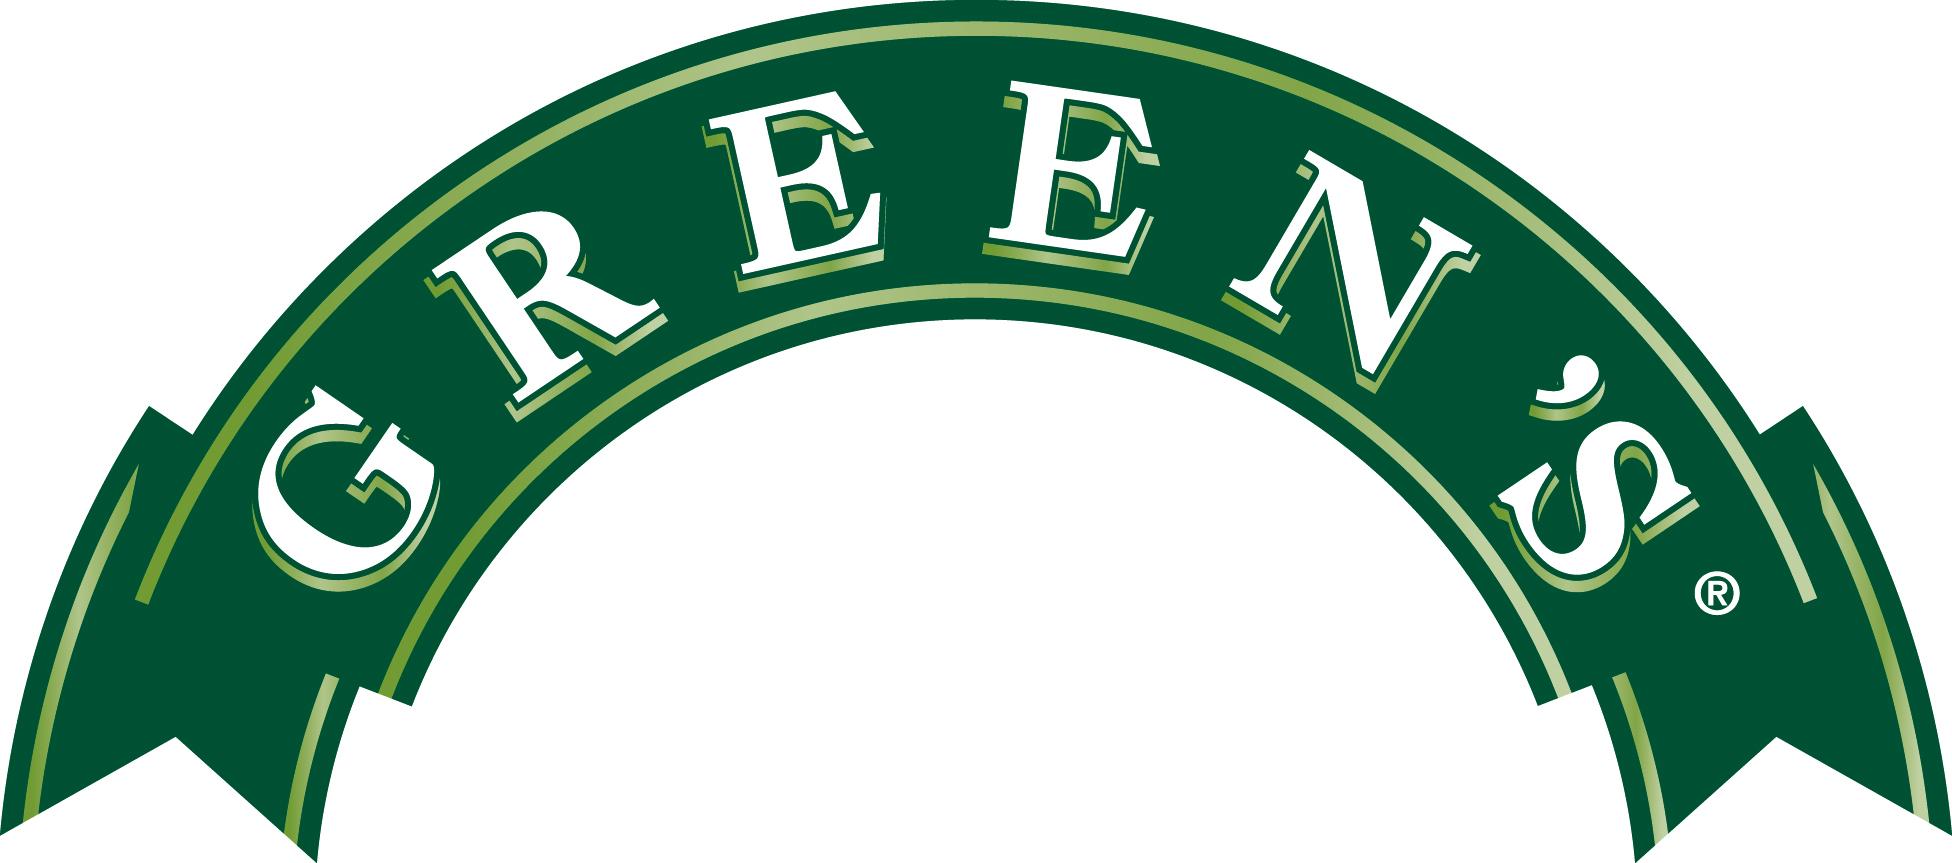 Greens Gluten Free Beers